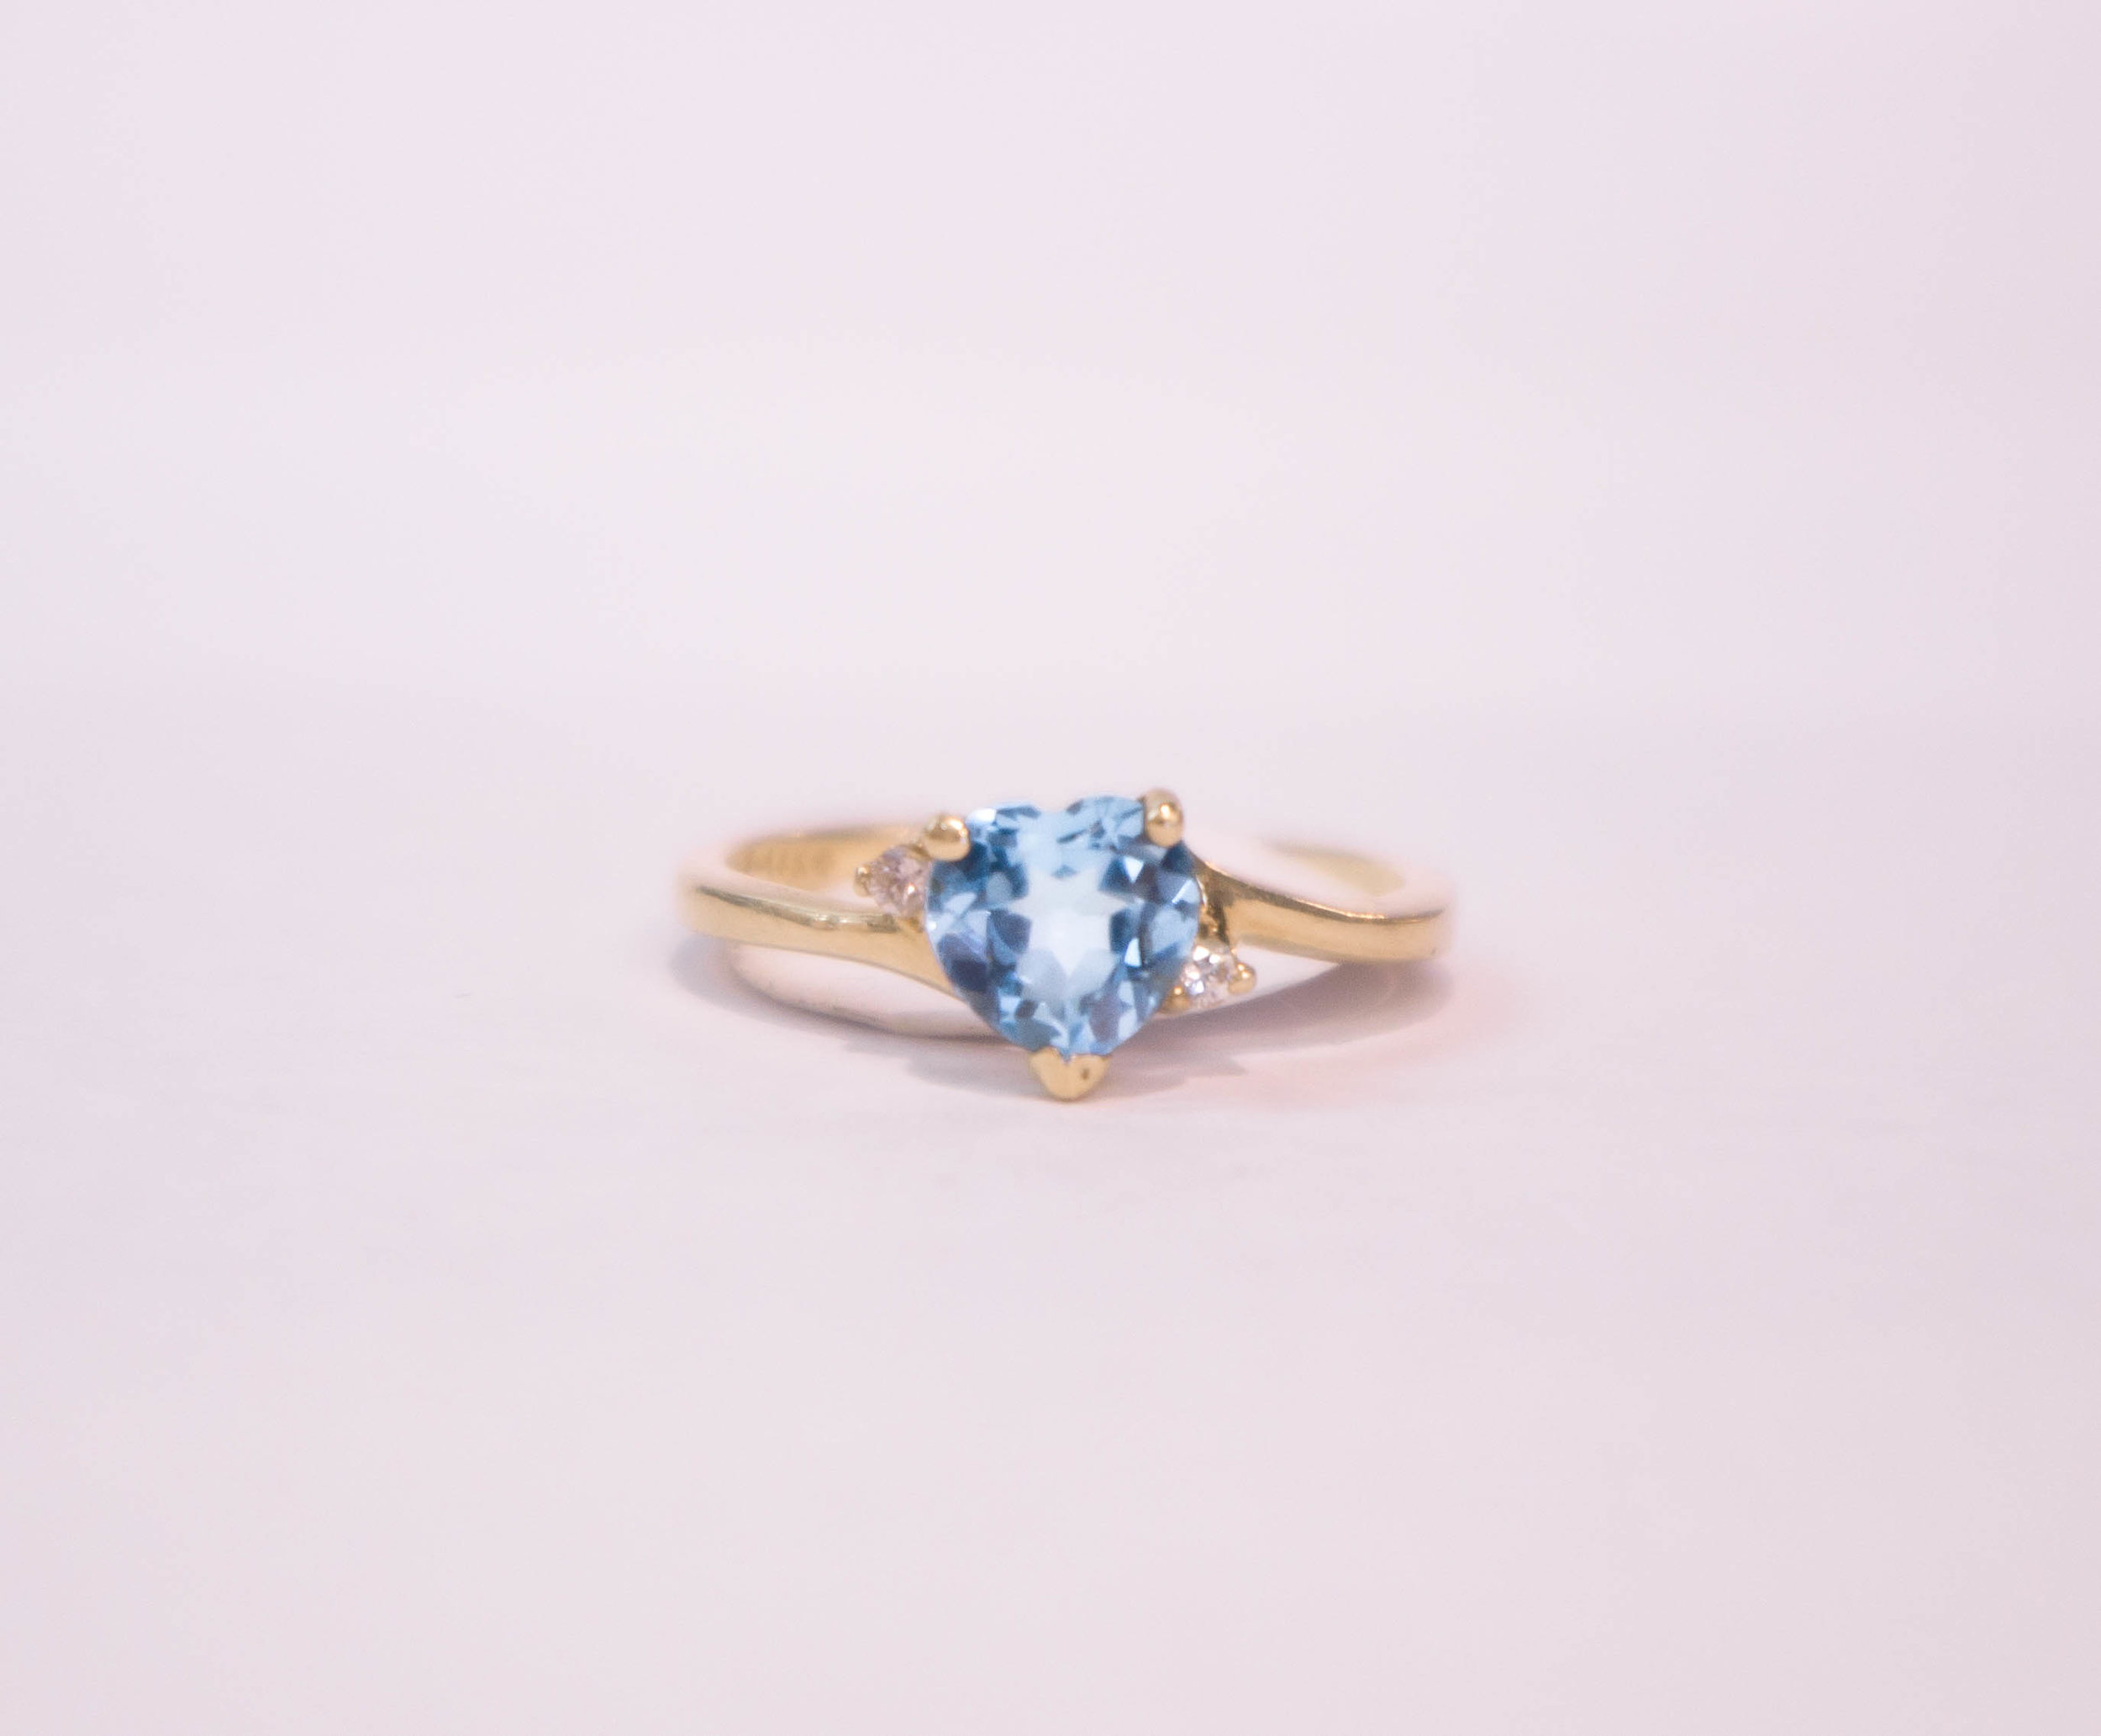 Estate Blue Topaz Heart with diamonds in 14kY.JPG